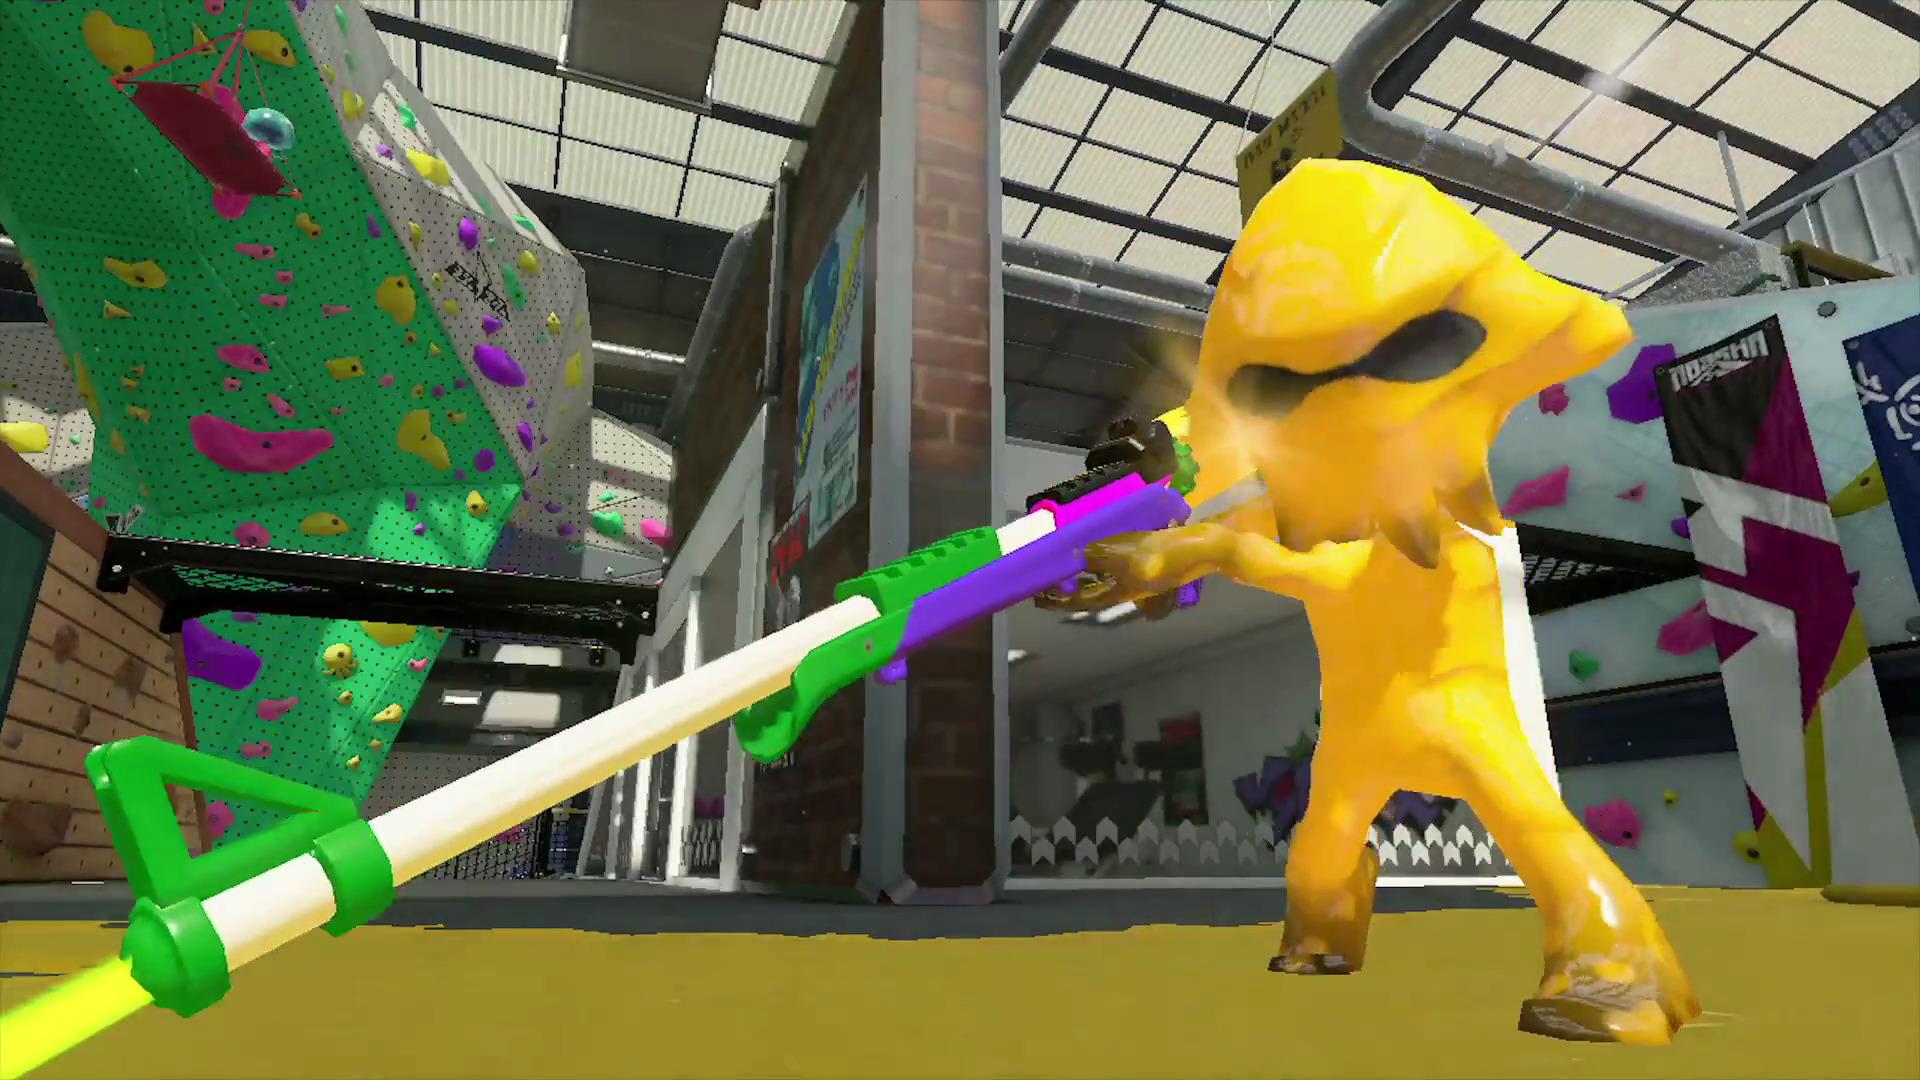 Splatoon 2 Fur Nintendo Switch Angekundigt